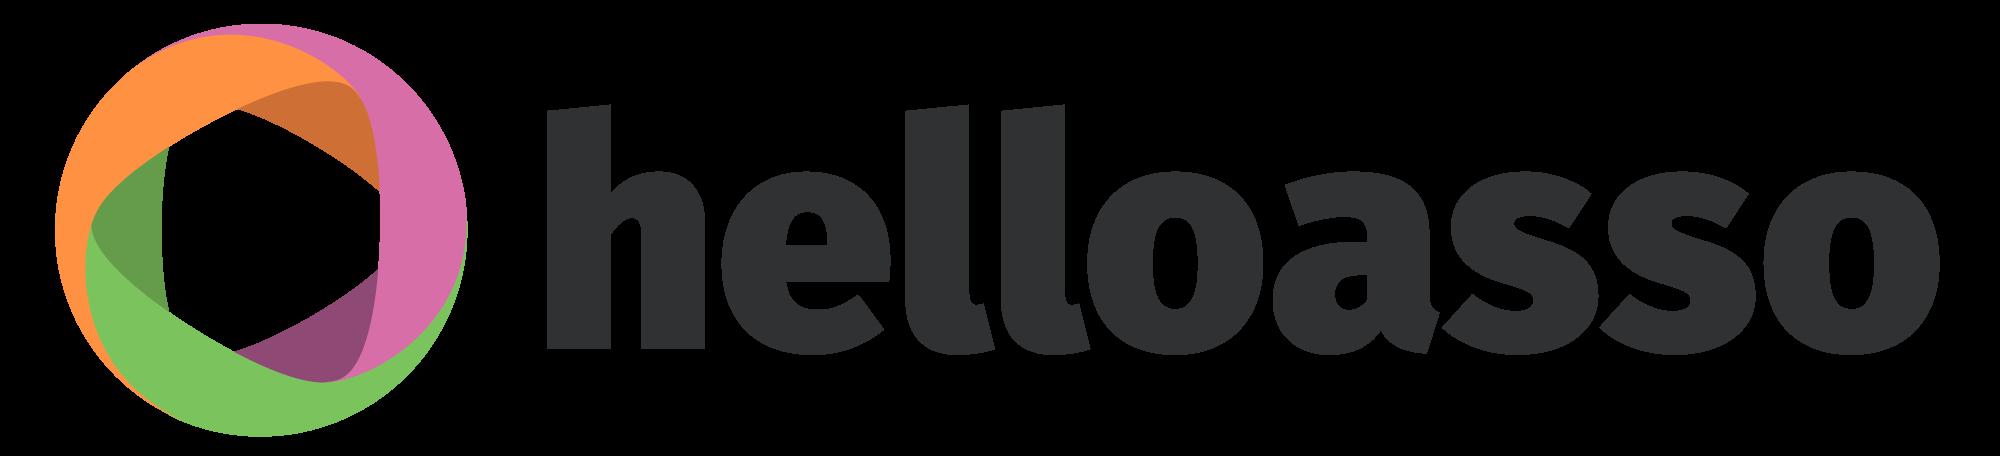 https://www.helloasso.com/Areas/HelloAsso/docs/helloasso-logo-couleurs-2015.png